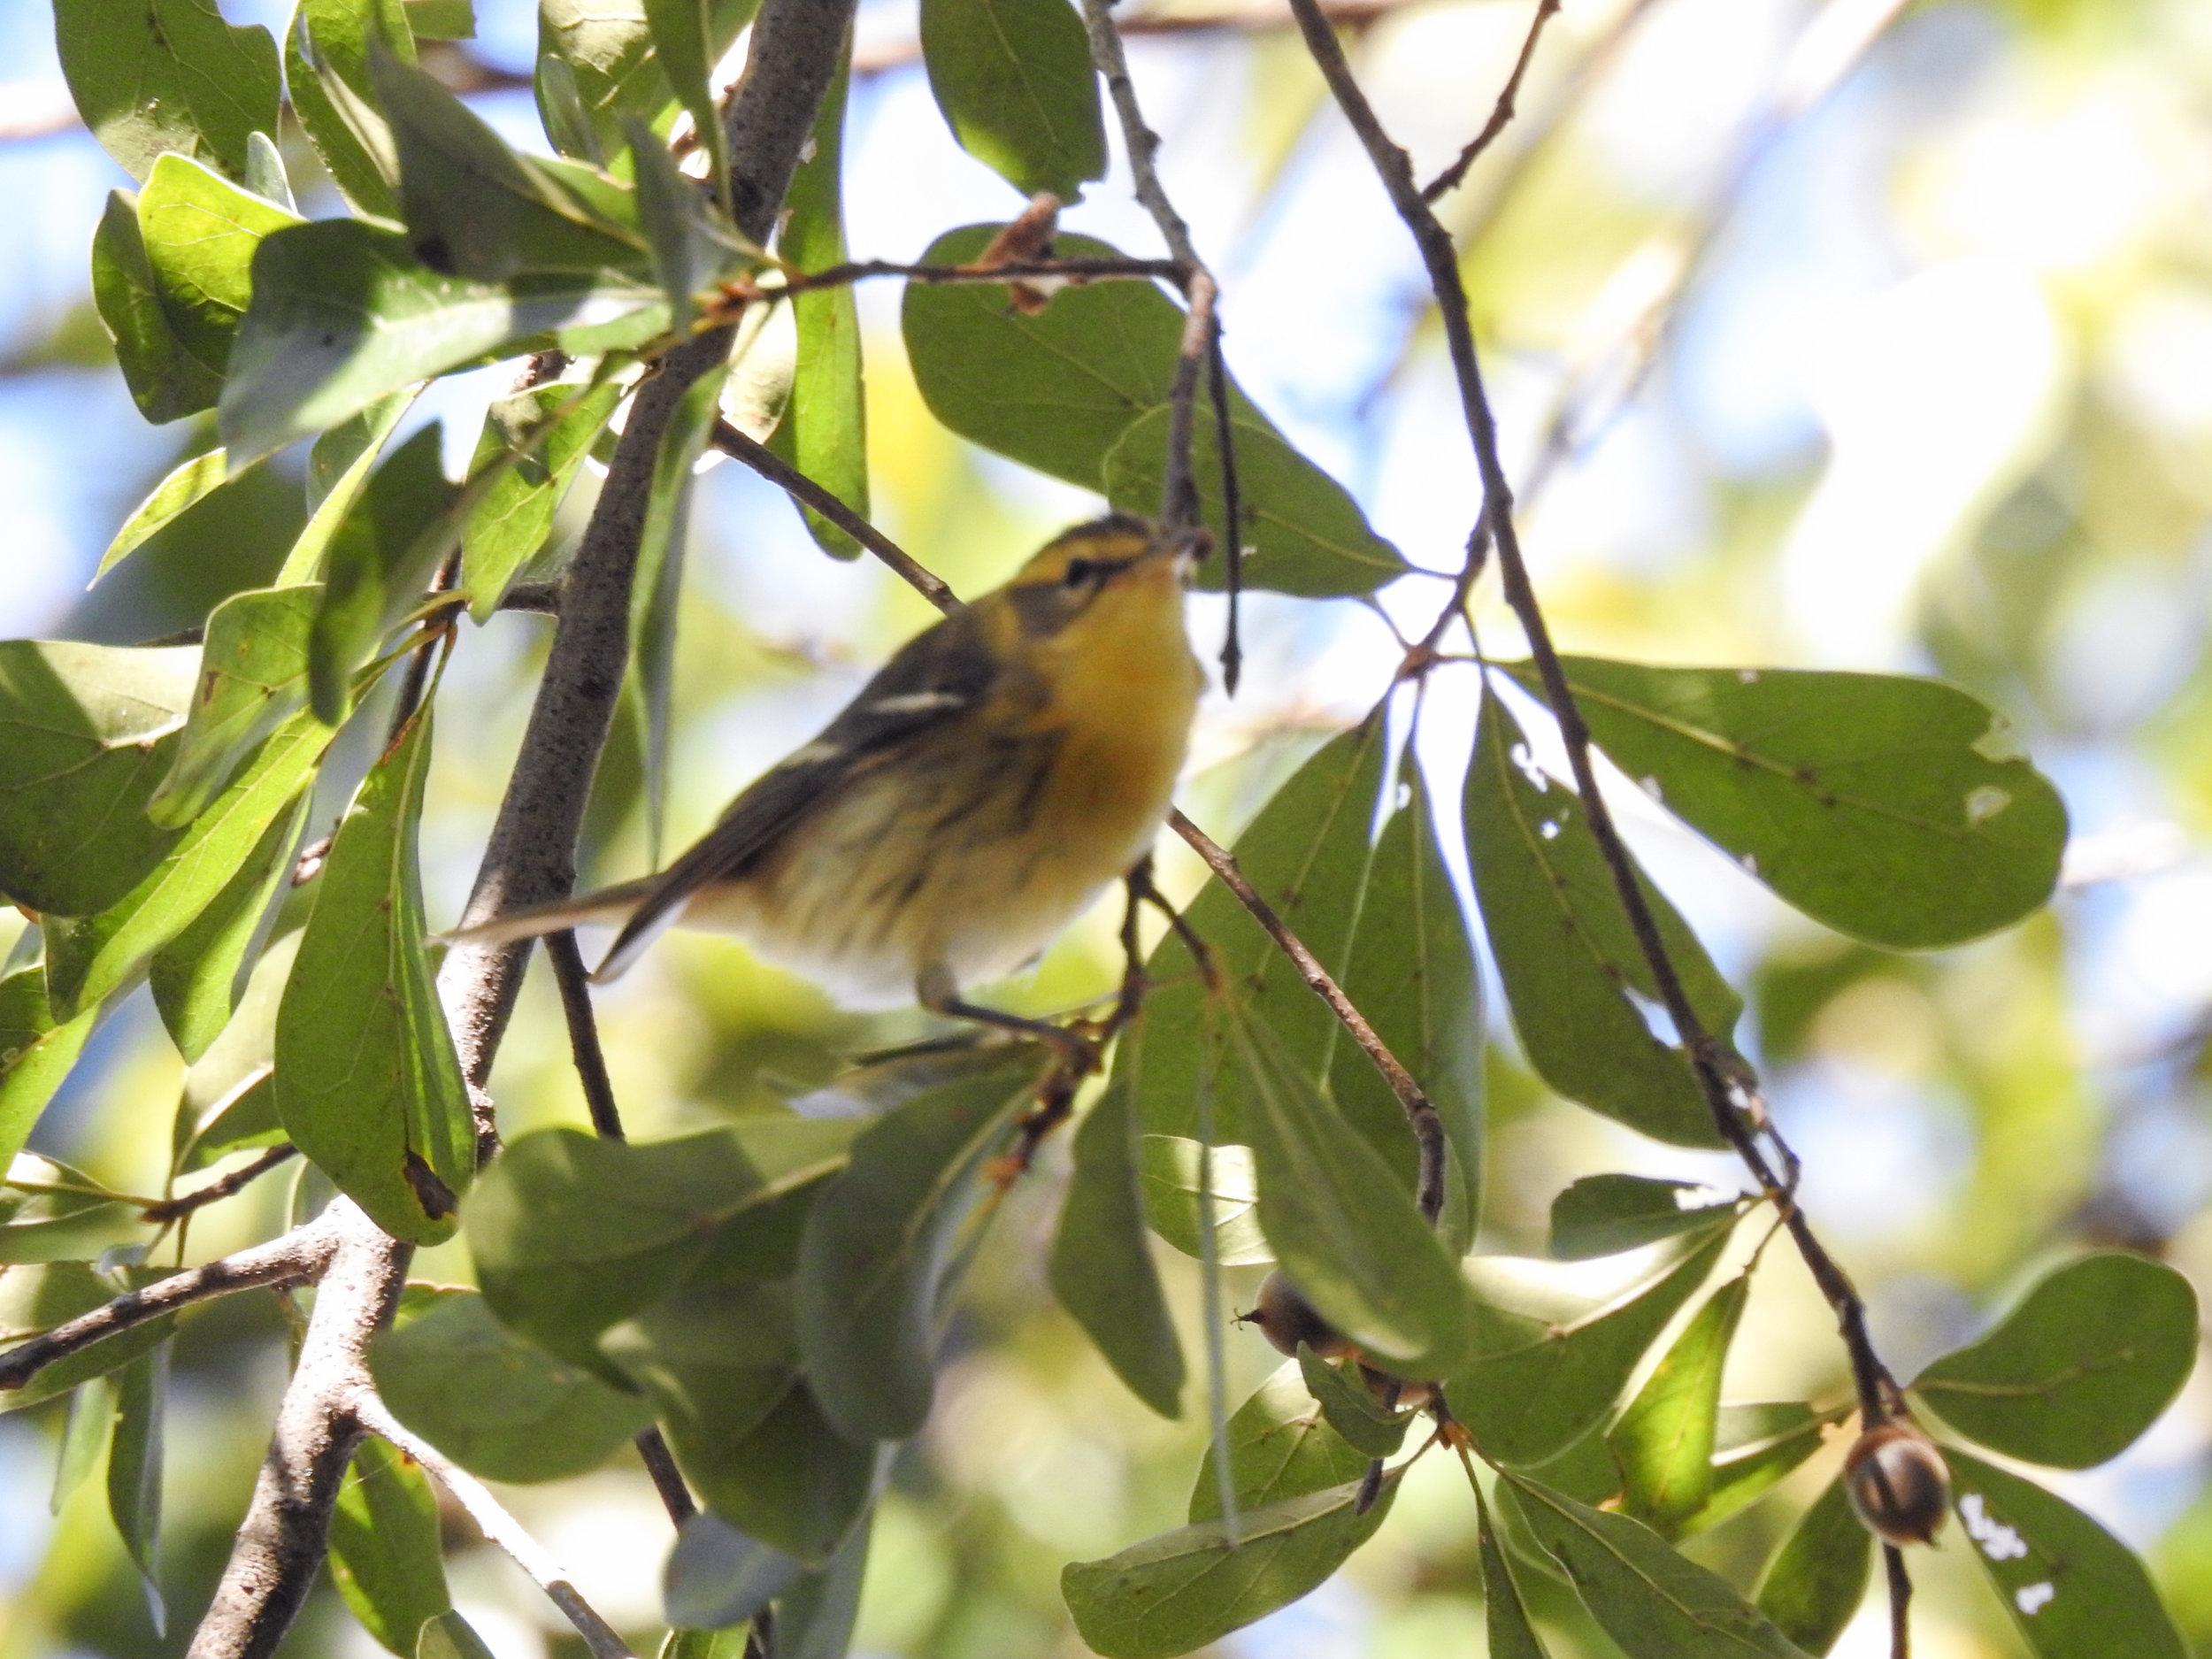 Blackburnian Warbler, female or immature